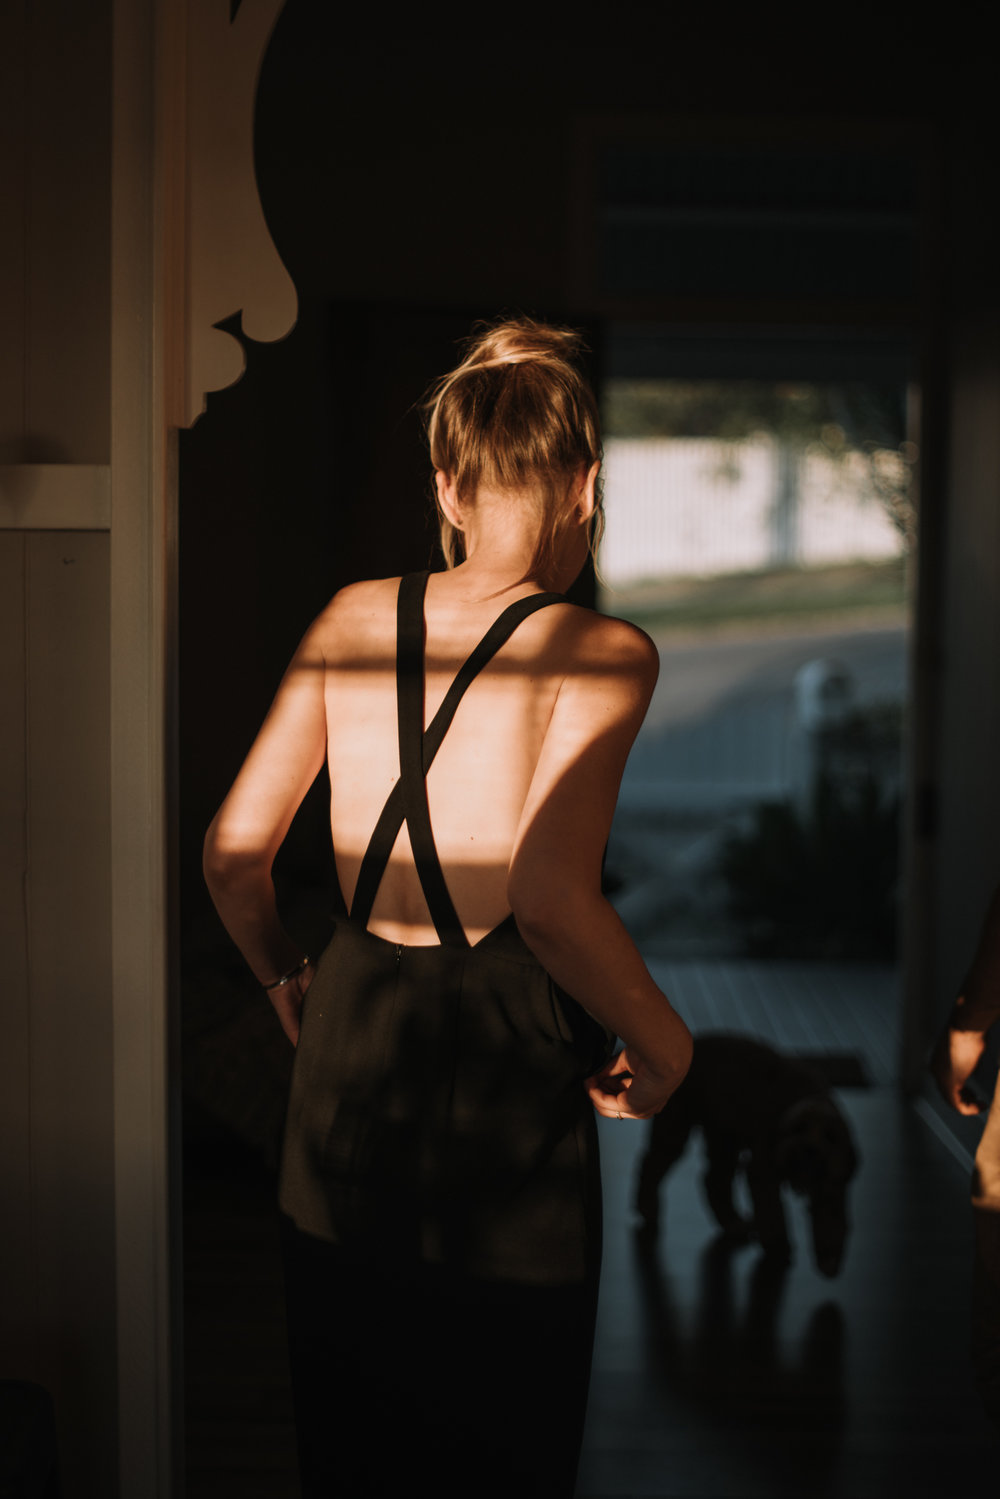 LOVELENSCAPES PHOTOGRAPHY • VISUAL POETRY • SOPHIA & VIJAY'S ENGAGEMENT • 1.jpg